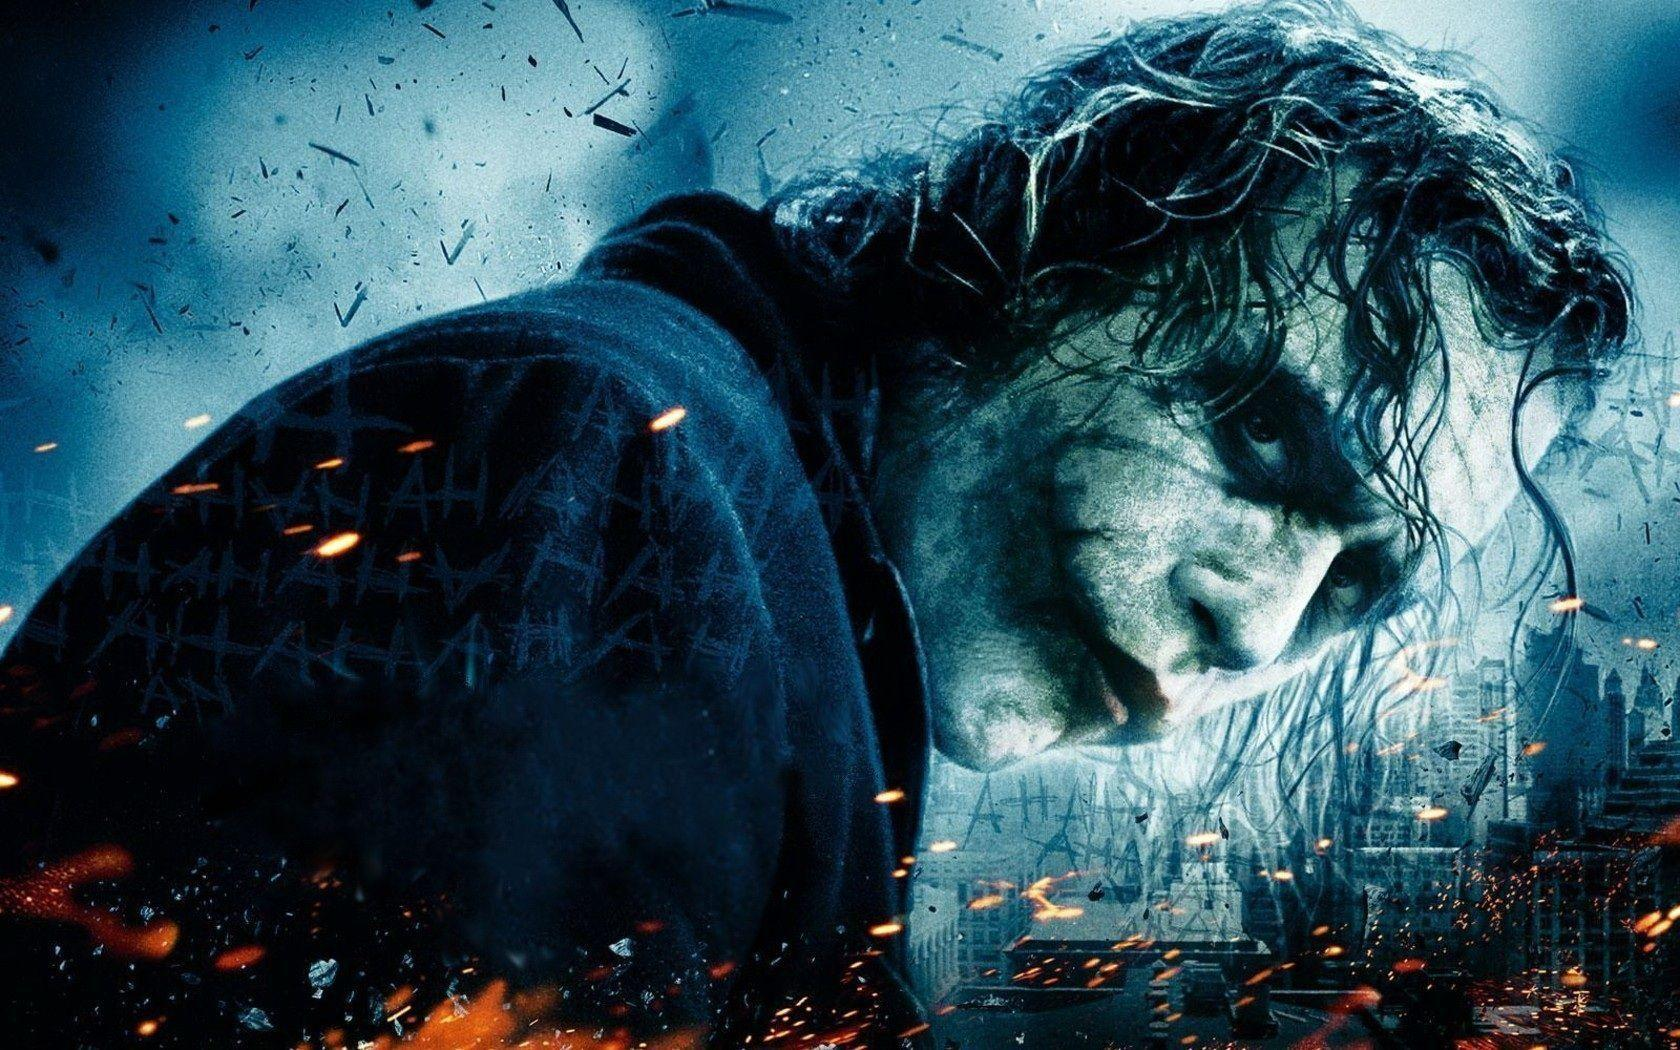 Heath Ledger Joker Wallpapers 1680x1050